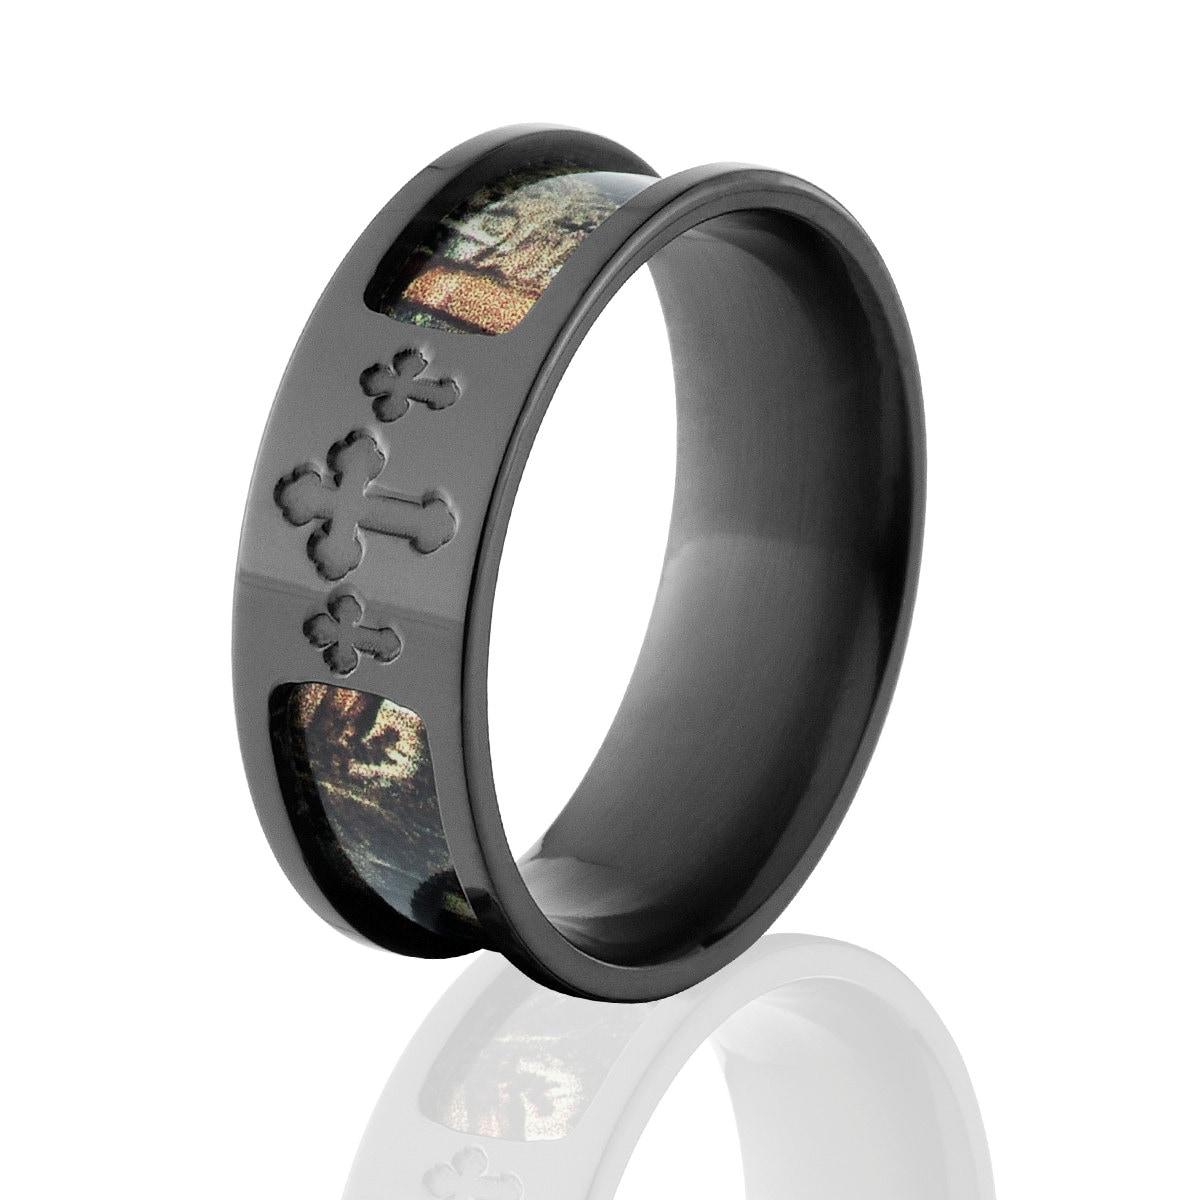 Realtree Wedding Rings: Celtic Cross Camo Rings RealTree Camo Rings Camo Wedding